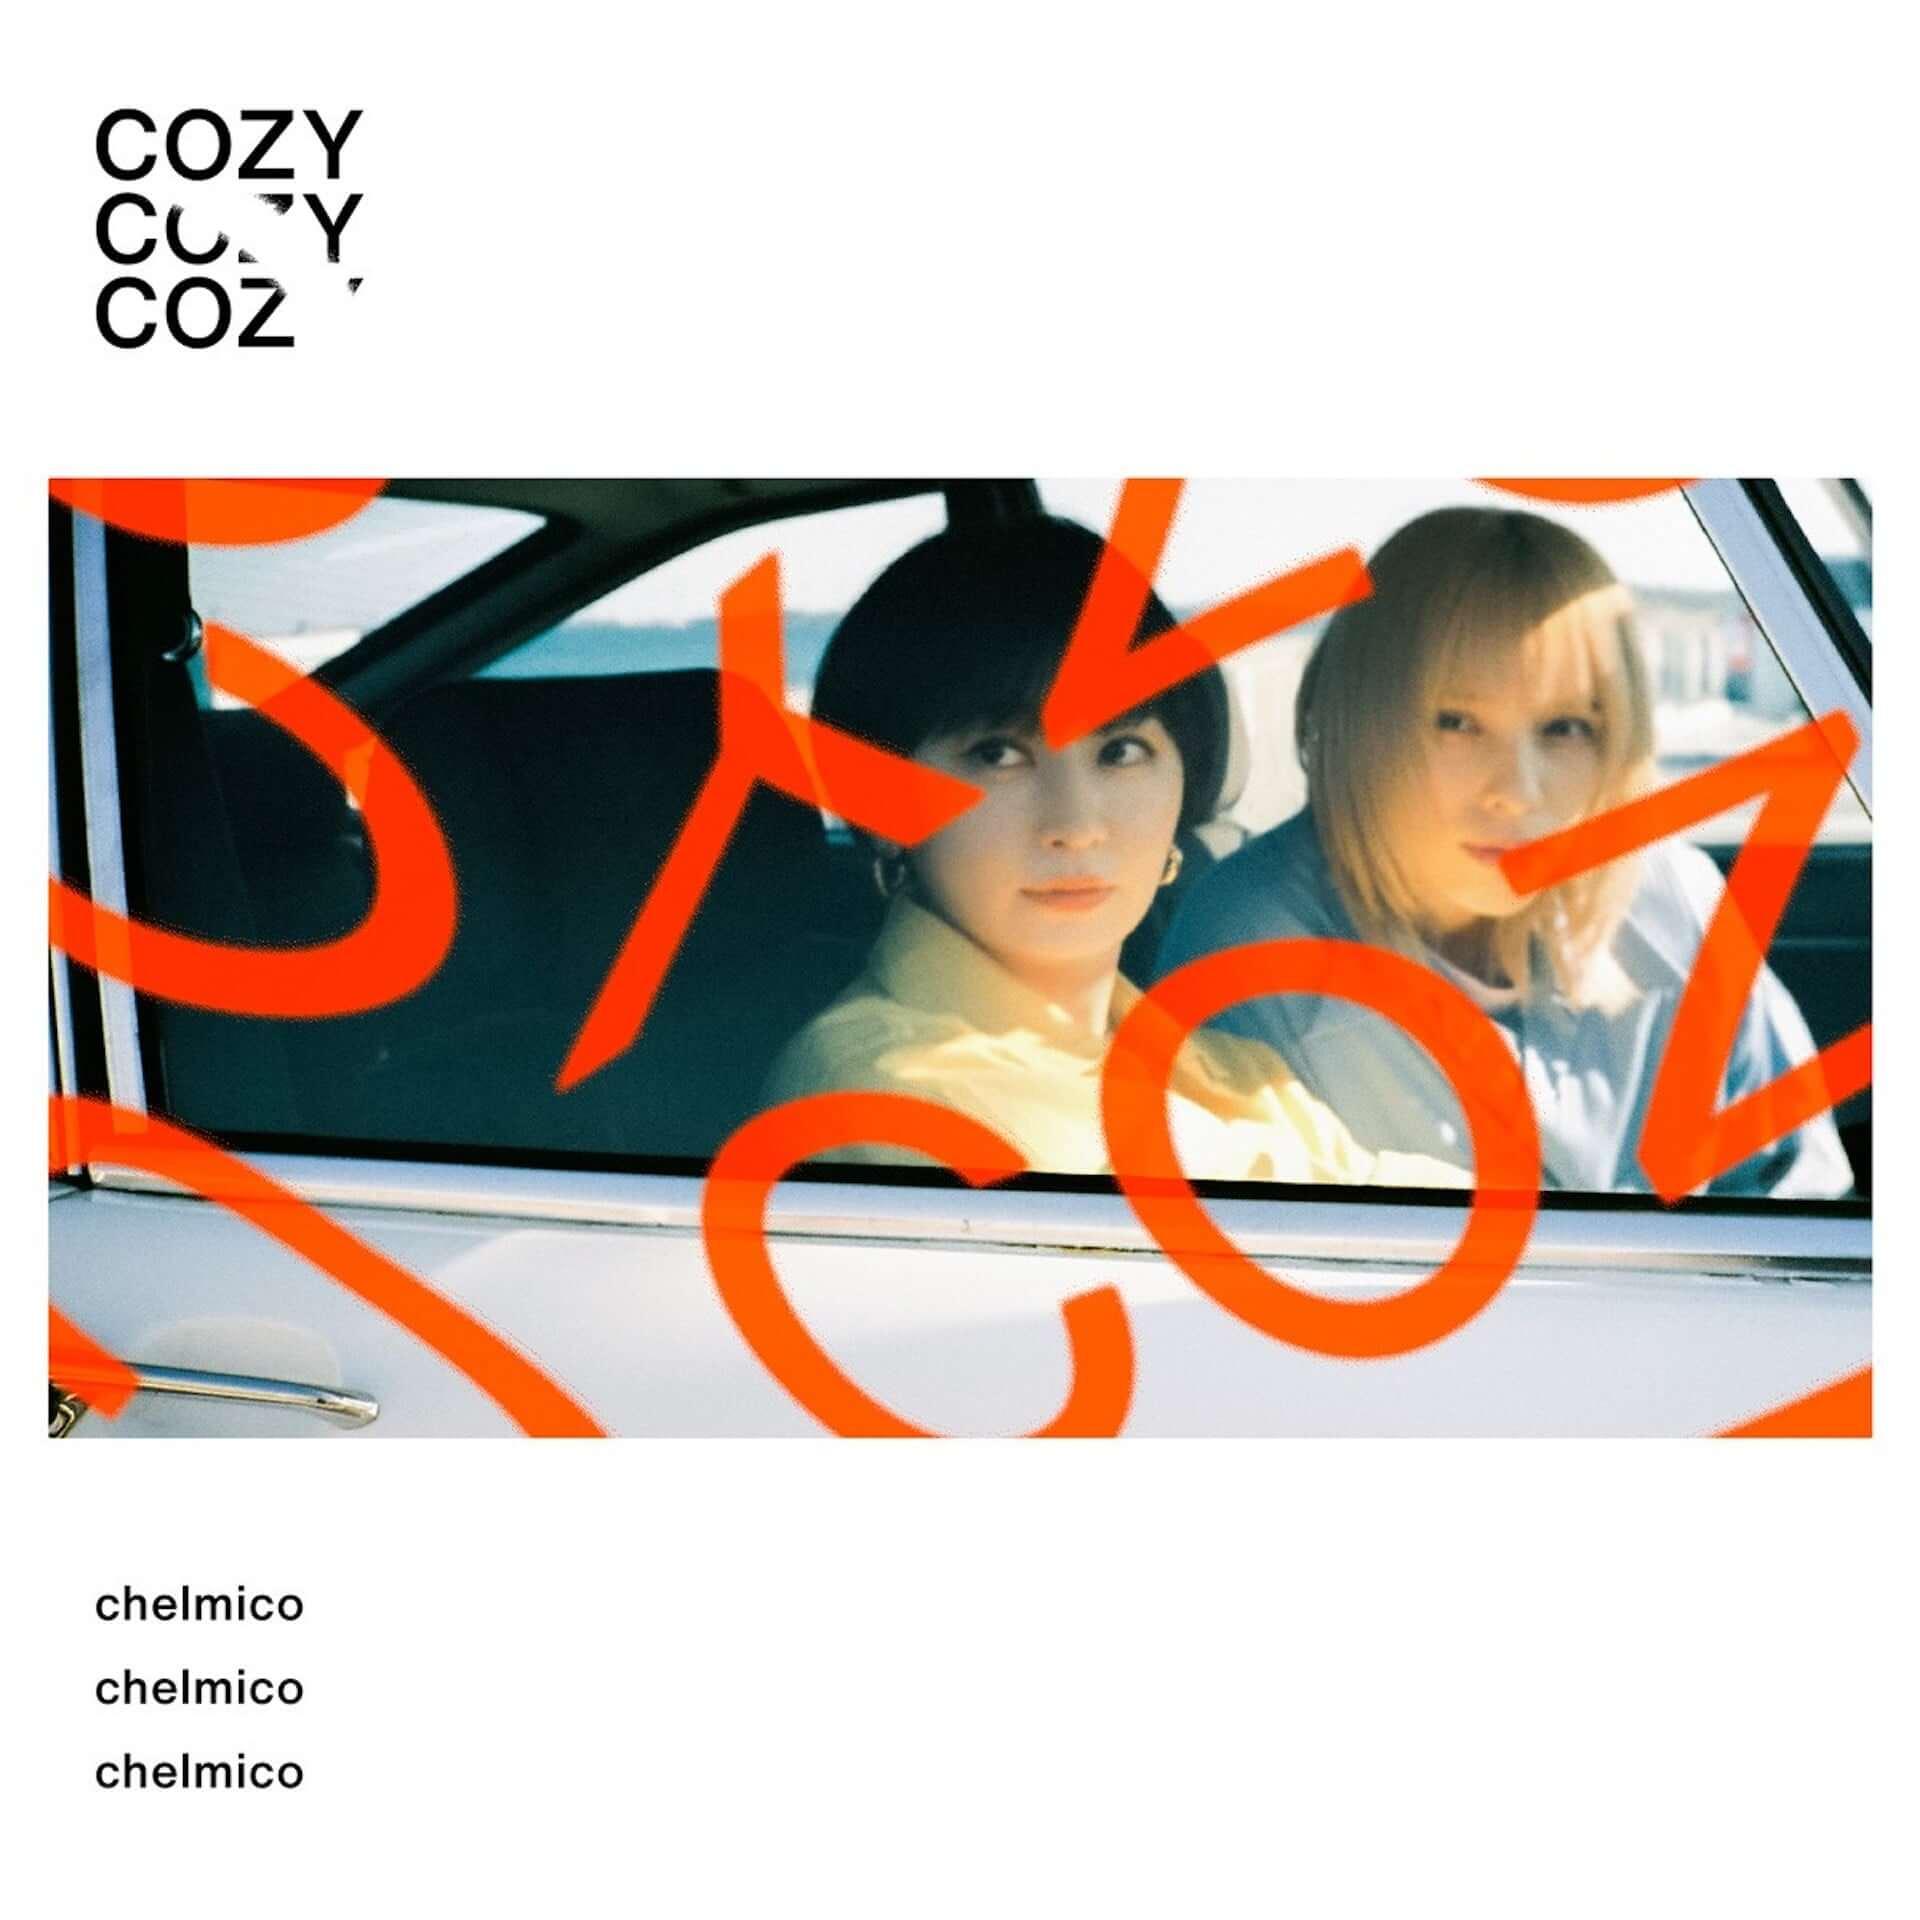 chelmicoが「COZY」と題した新曲&ミニアルバムを配信決定!最新ビジュアルとコメントも到着「日常を取り戻すための作品」 music210305_chelmico_2-1920x1920